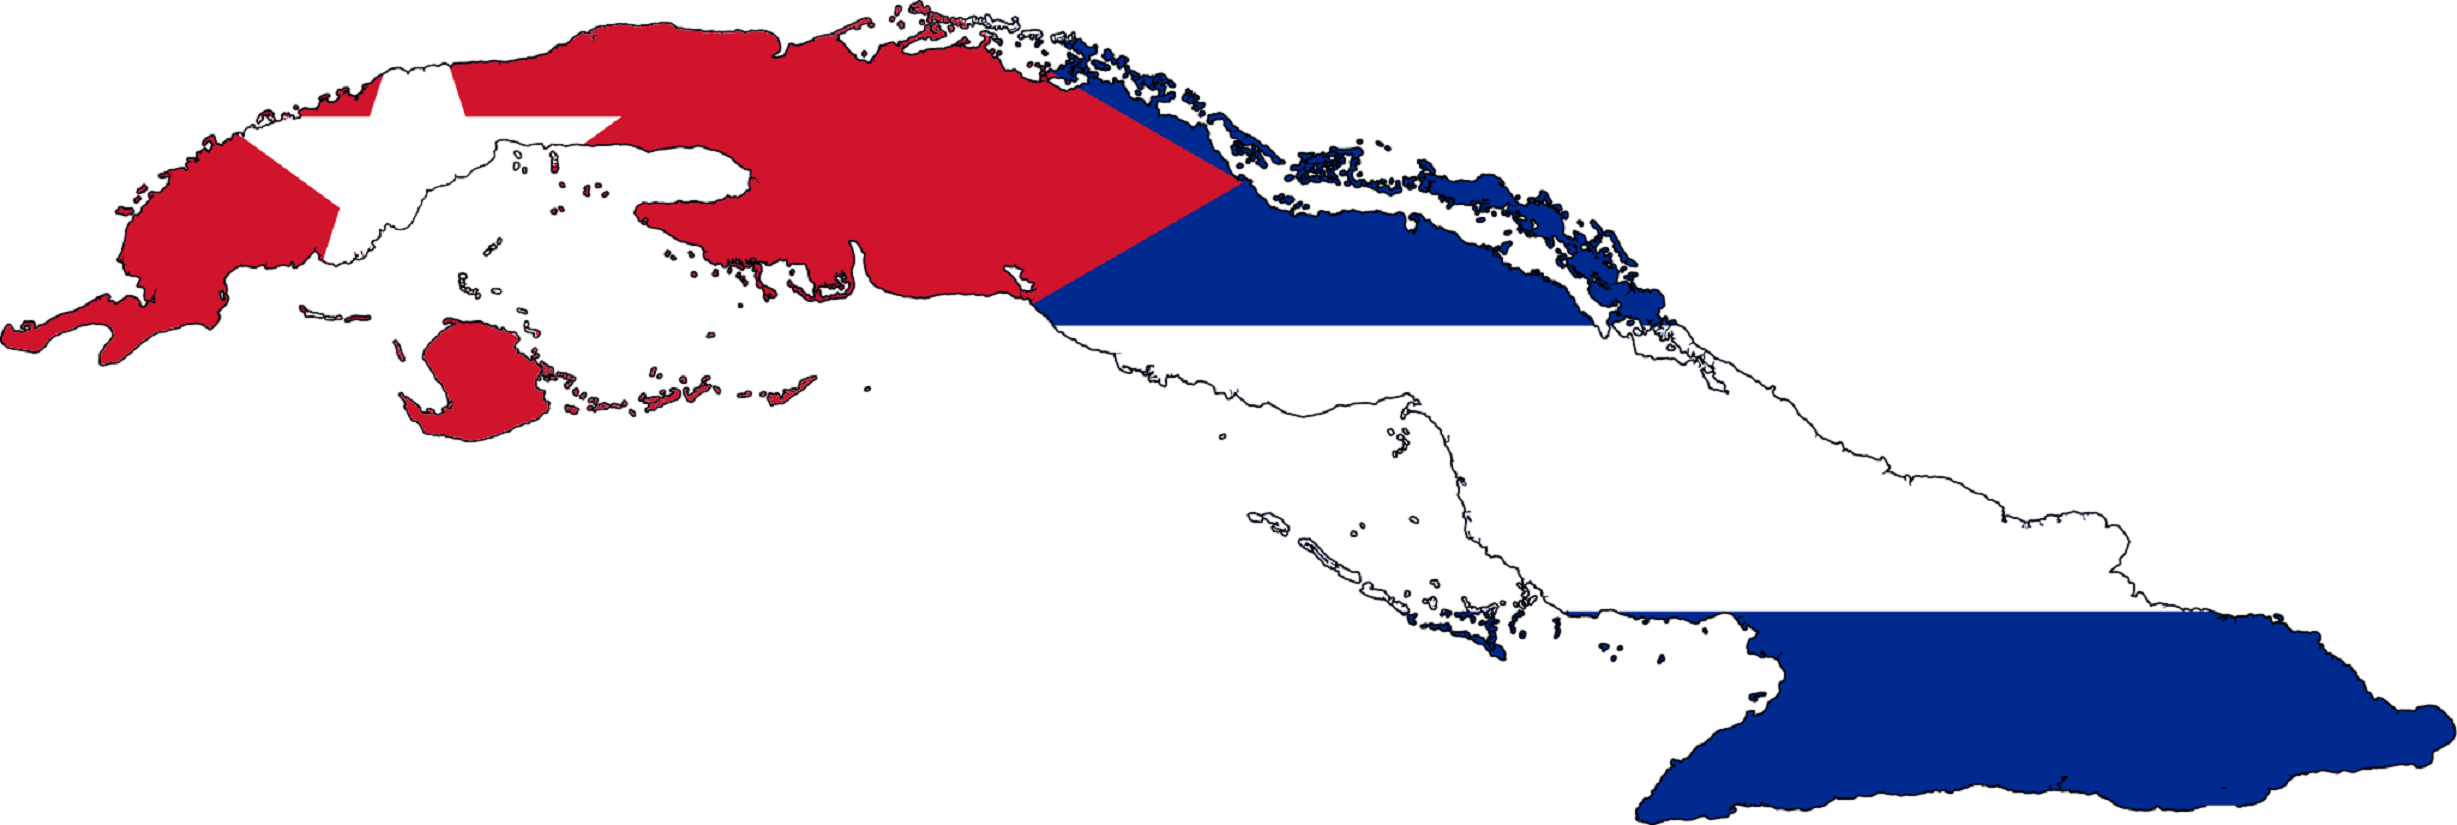 Cuban Flag Wallpapers 2457x825